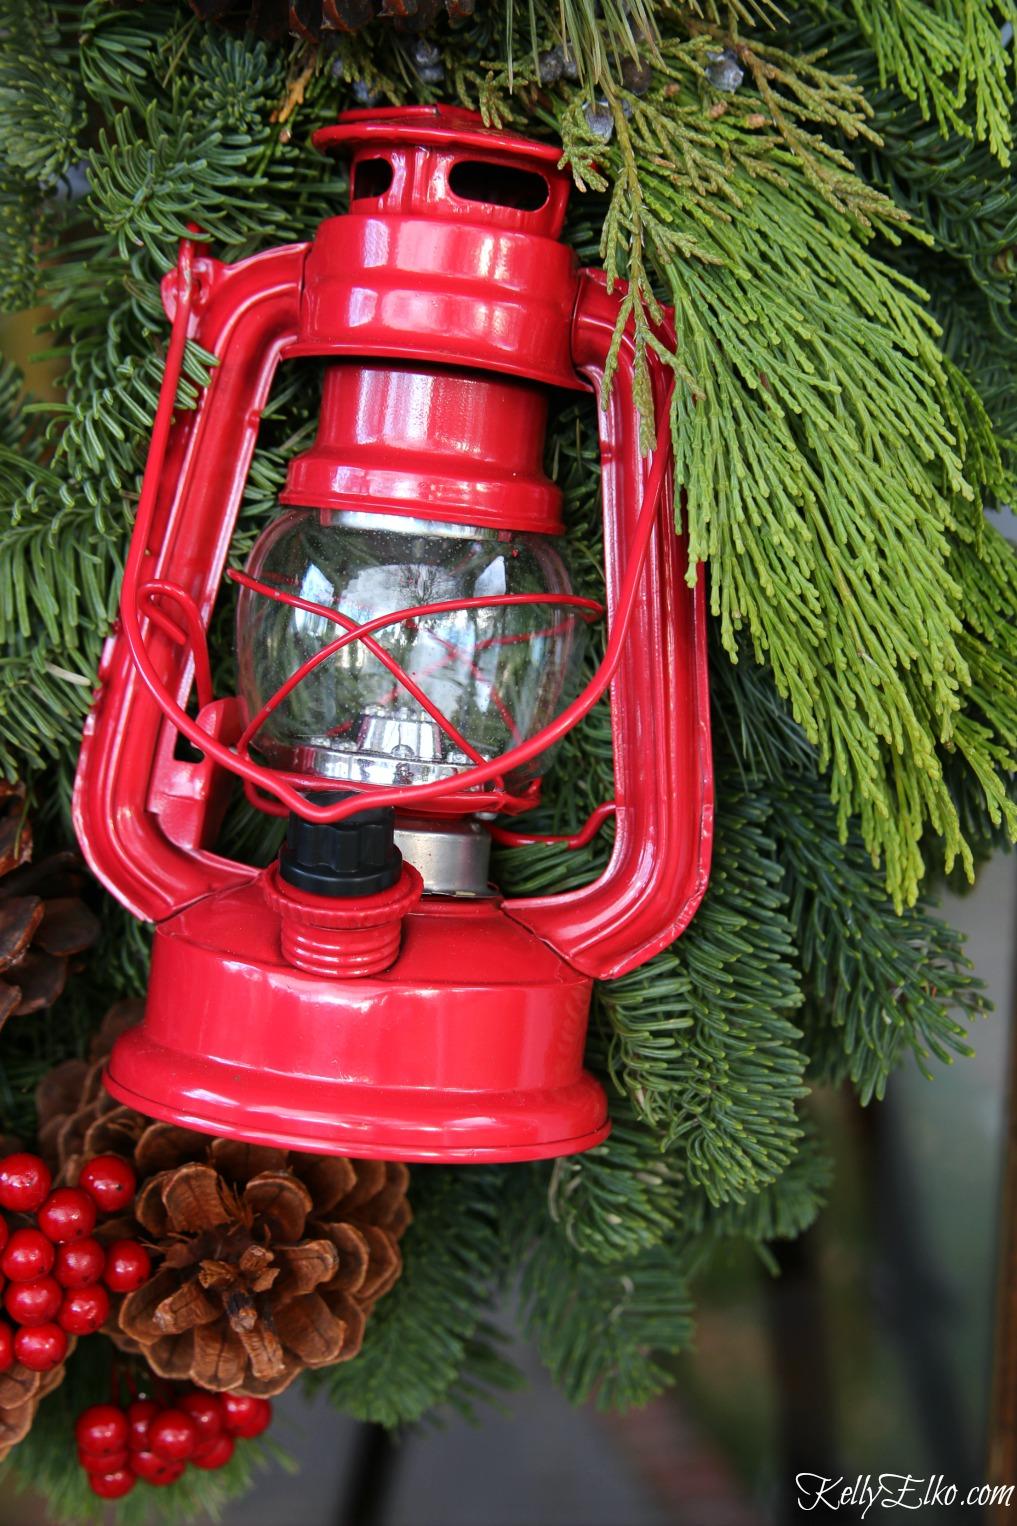 Cute little red lantern on a Christmas wreath kellyelko.com